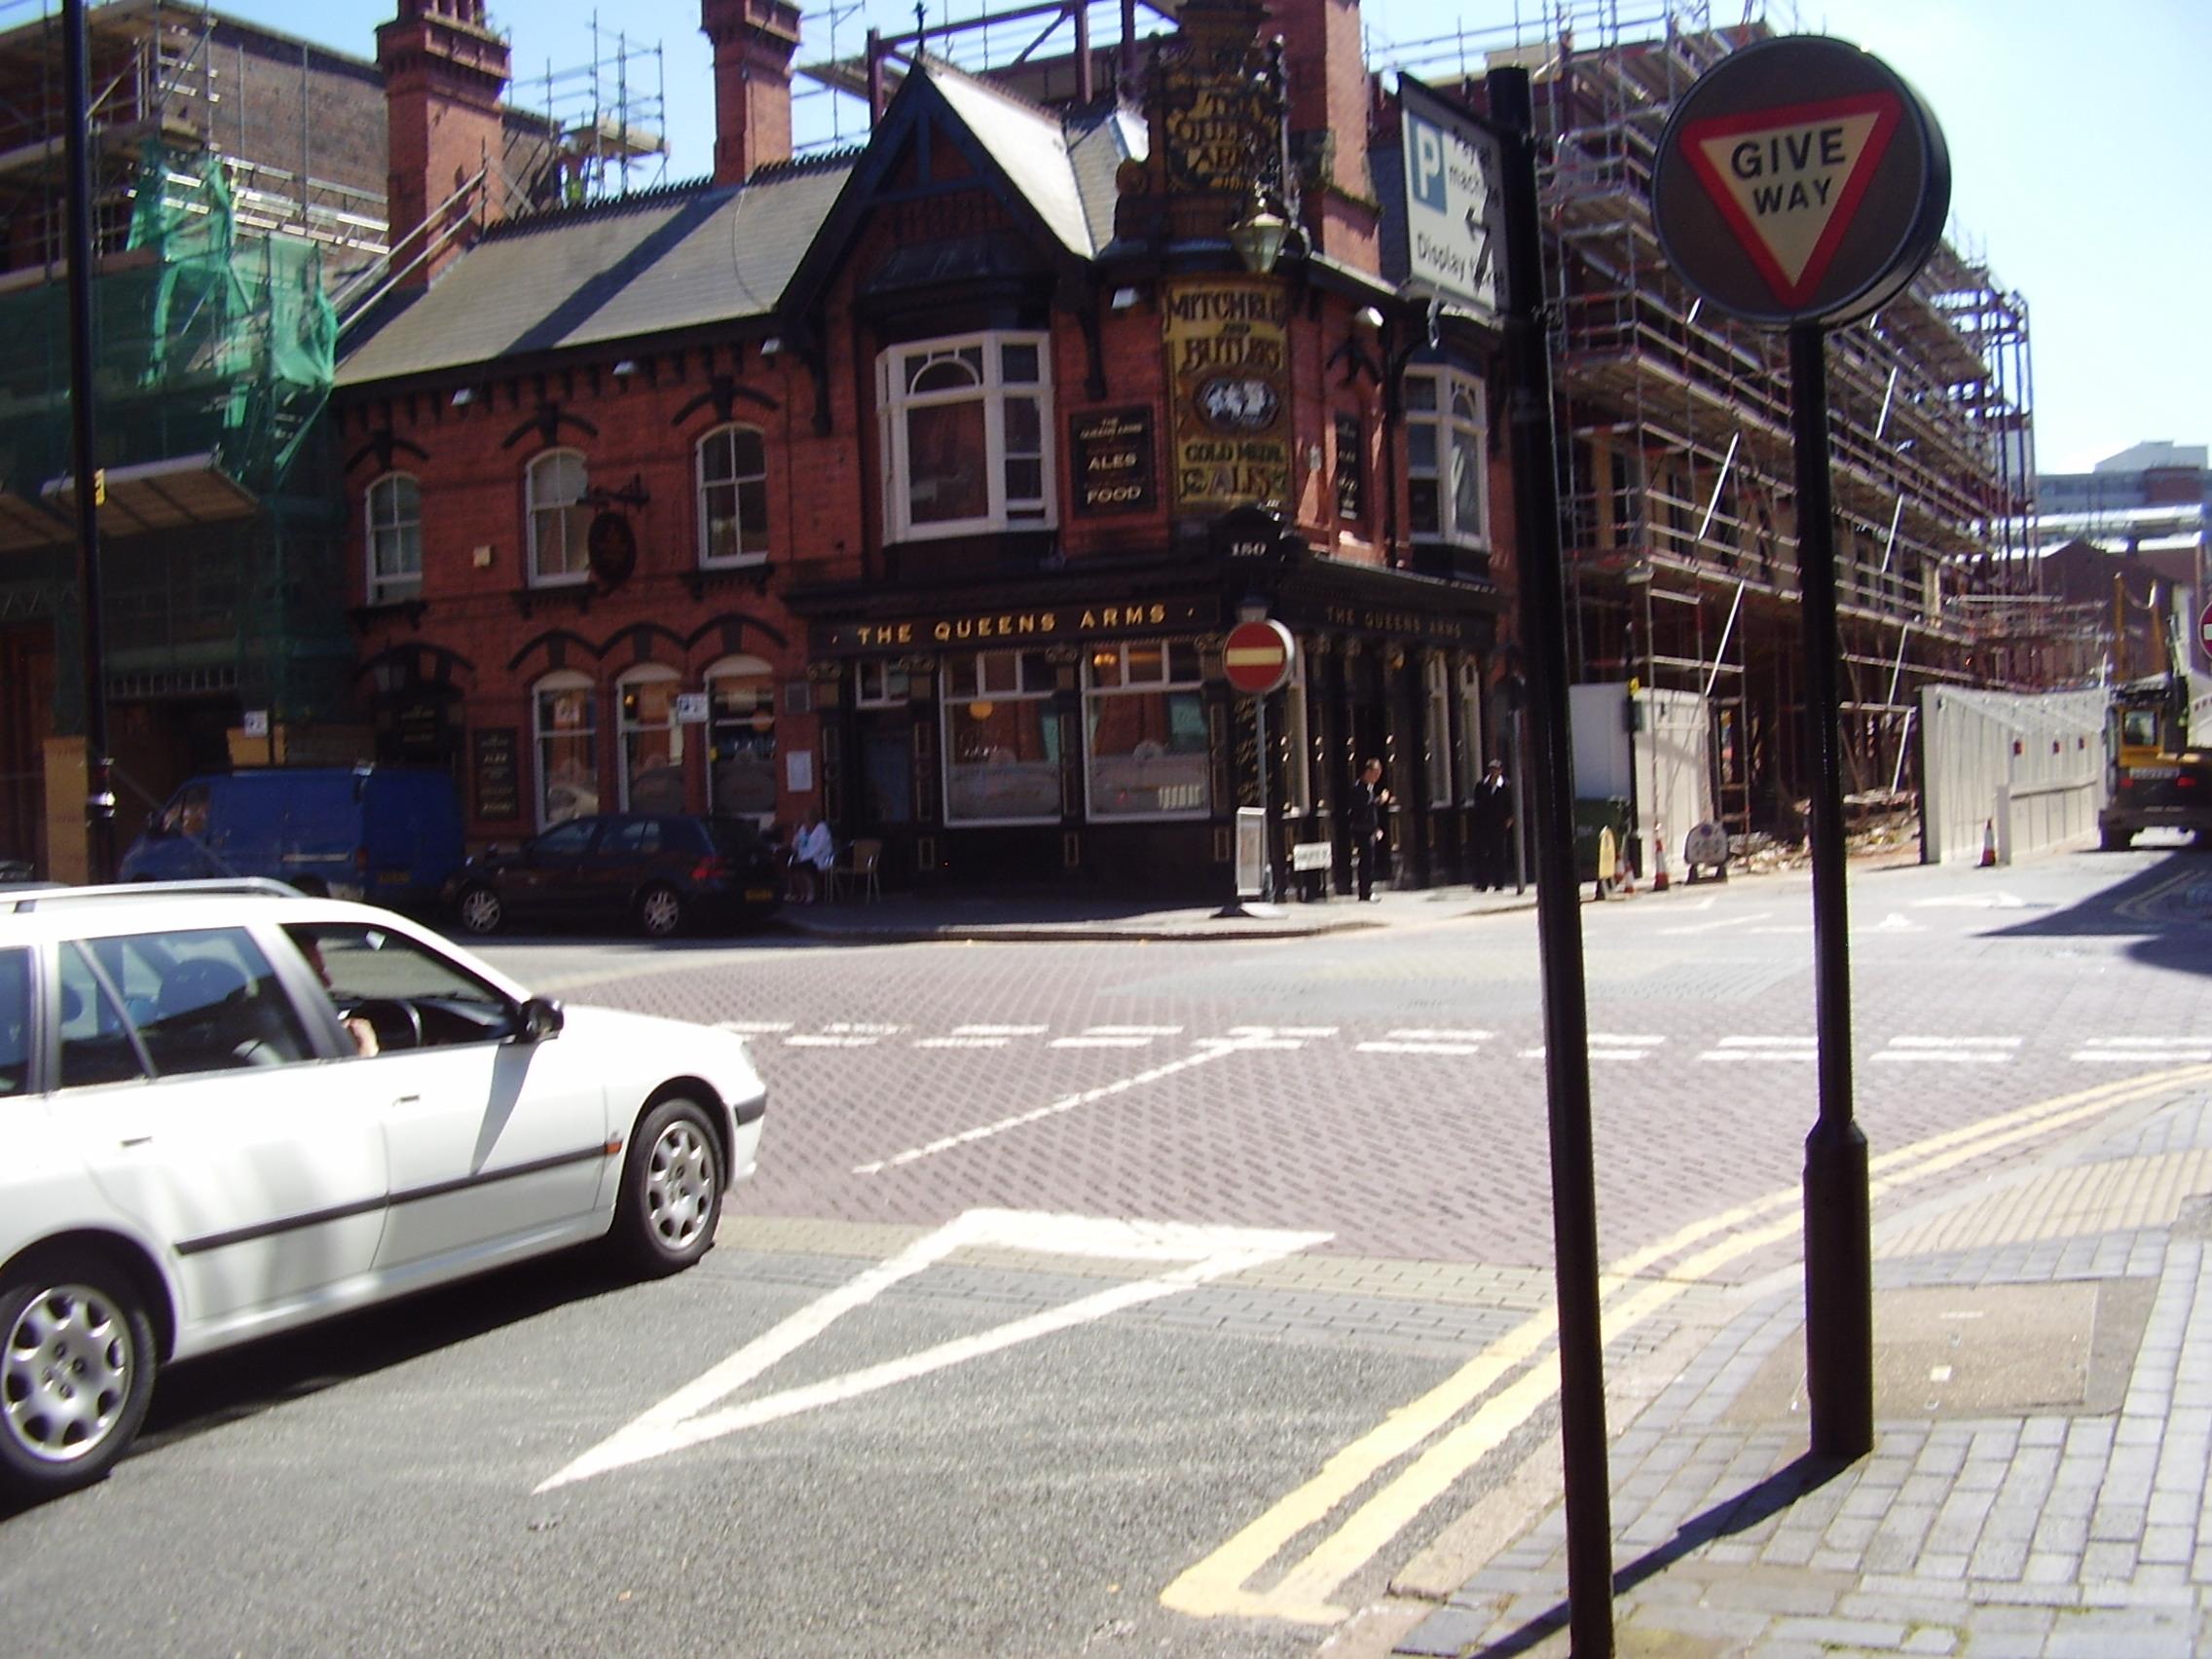 2008 Street view photo 26 of the Jewellery Quarter Birmingham